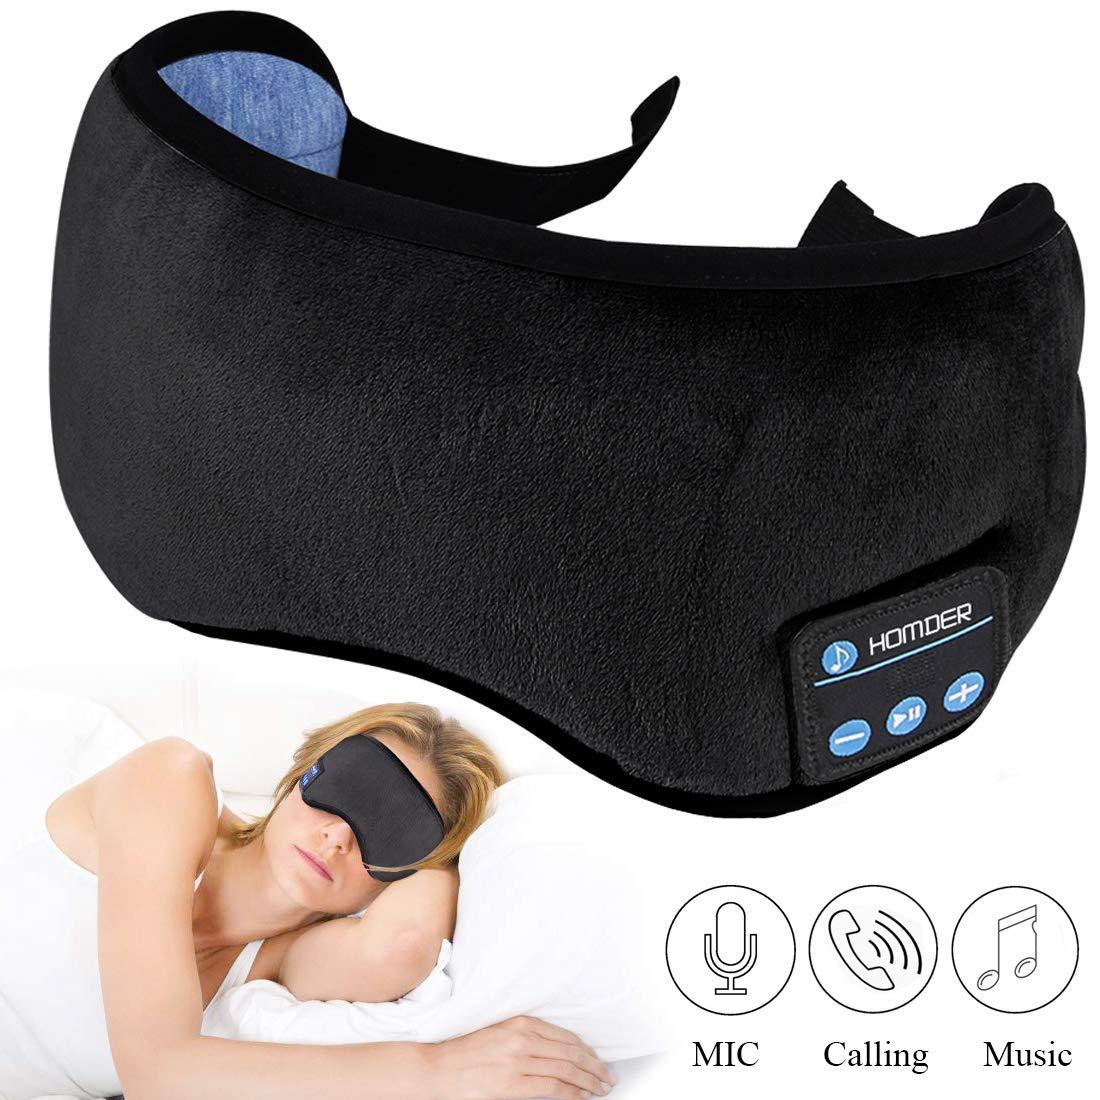 Sleep Headphones Bluetooth 5.0 Wireless Eye Mask - Homder Headphones Travel Sleeping Headband Built-in Speakers Microphone Handsfree Adjustable Washable (Grey) sleepbuds - 71K517qjDUL - Sleepbuds – Review on sleep noise masking sleepbuds